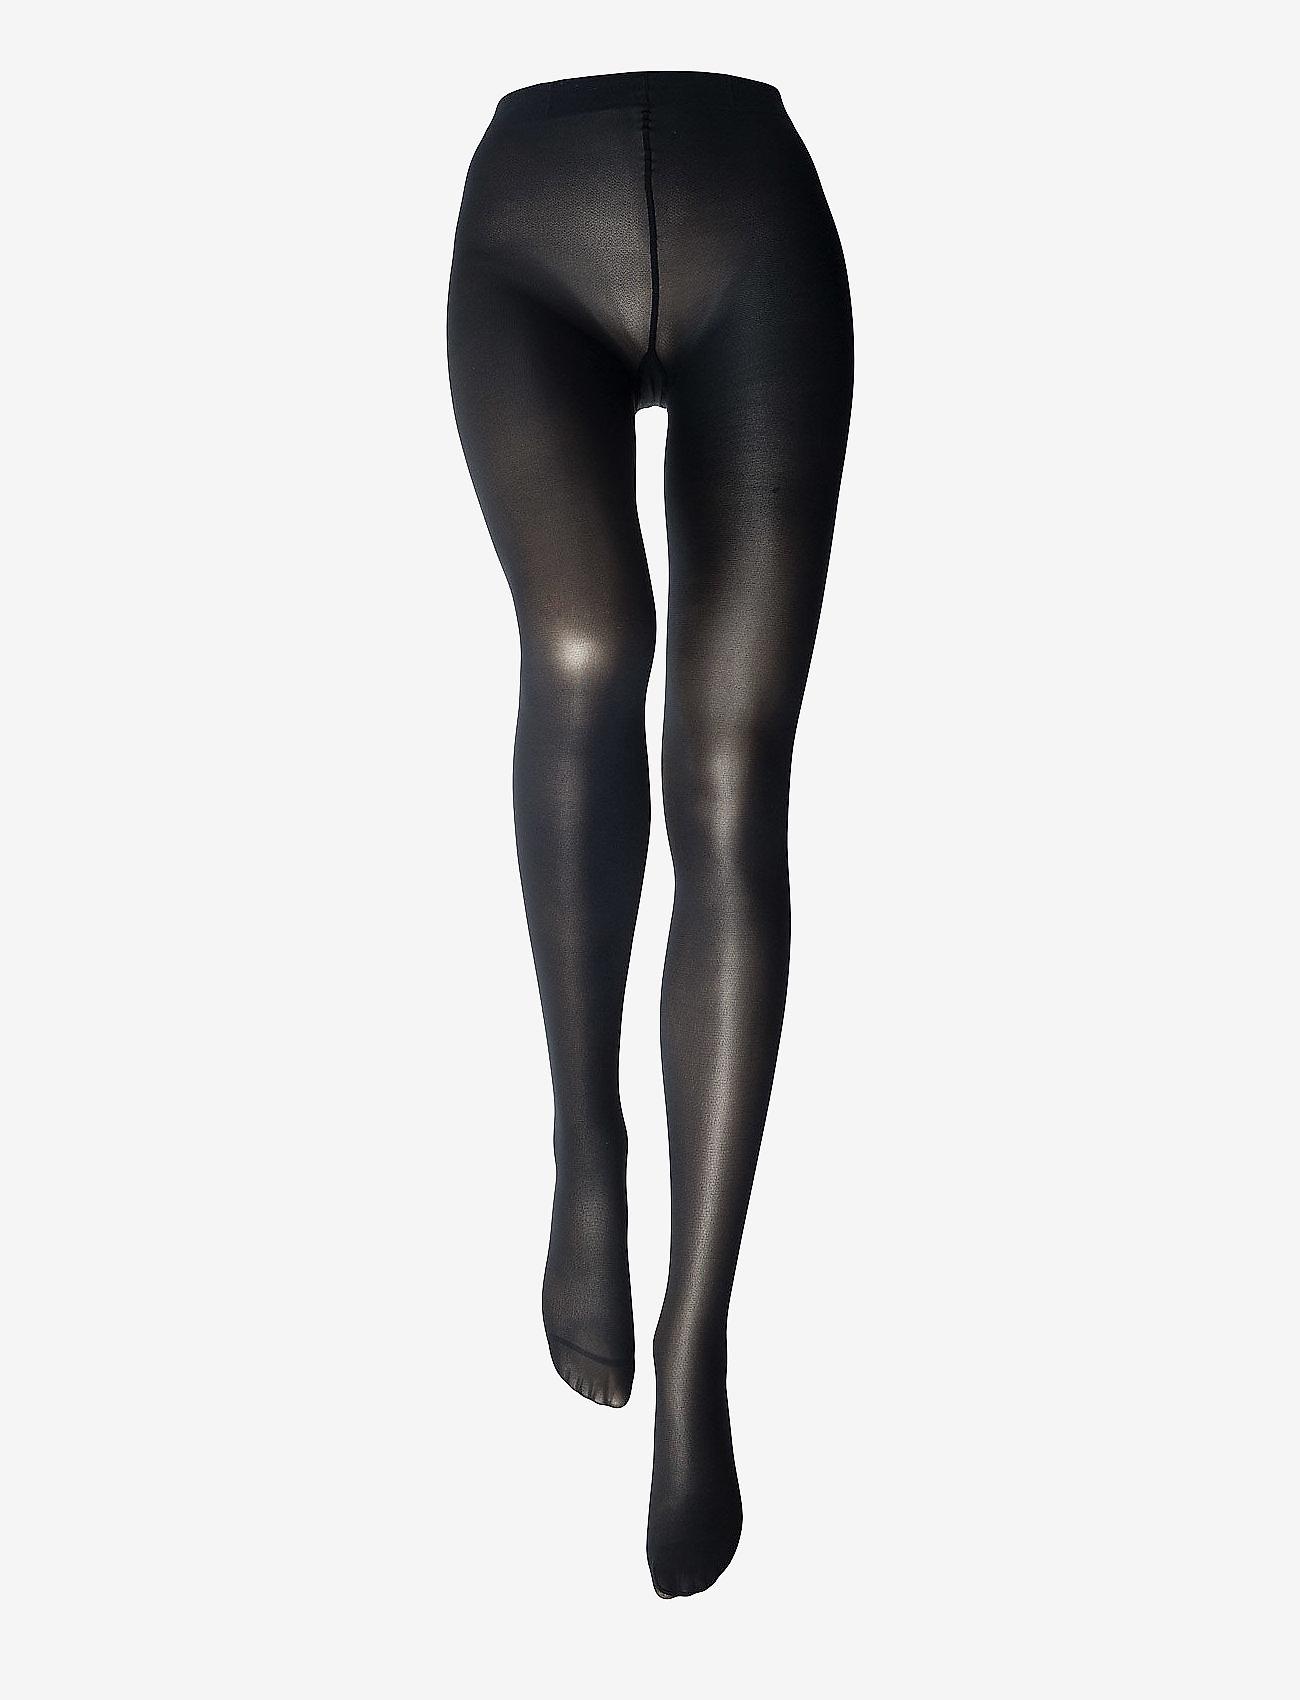 Vogue - Ladies den pantyhose, Opaque 40 den - basic pantyhose - marine - 1